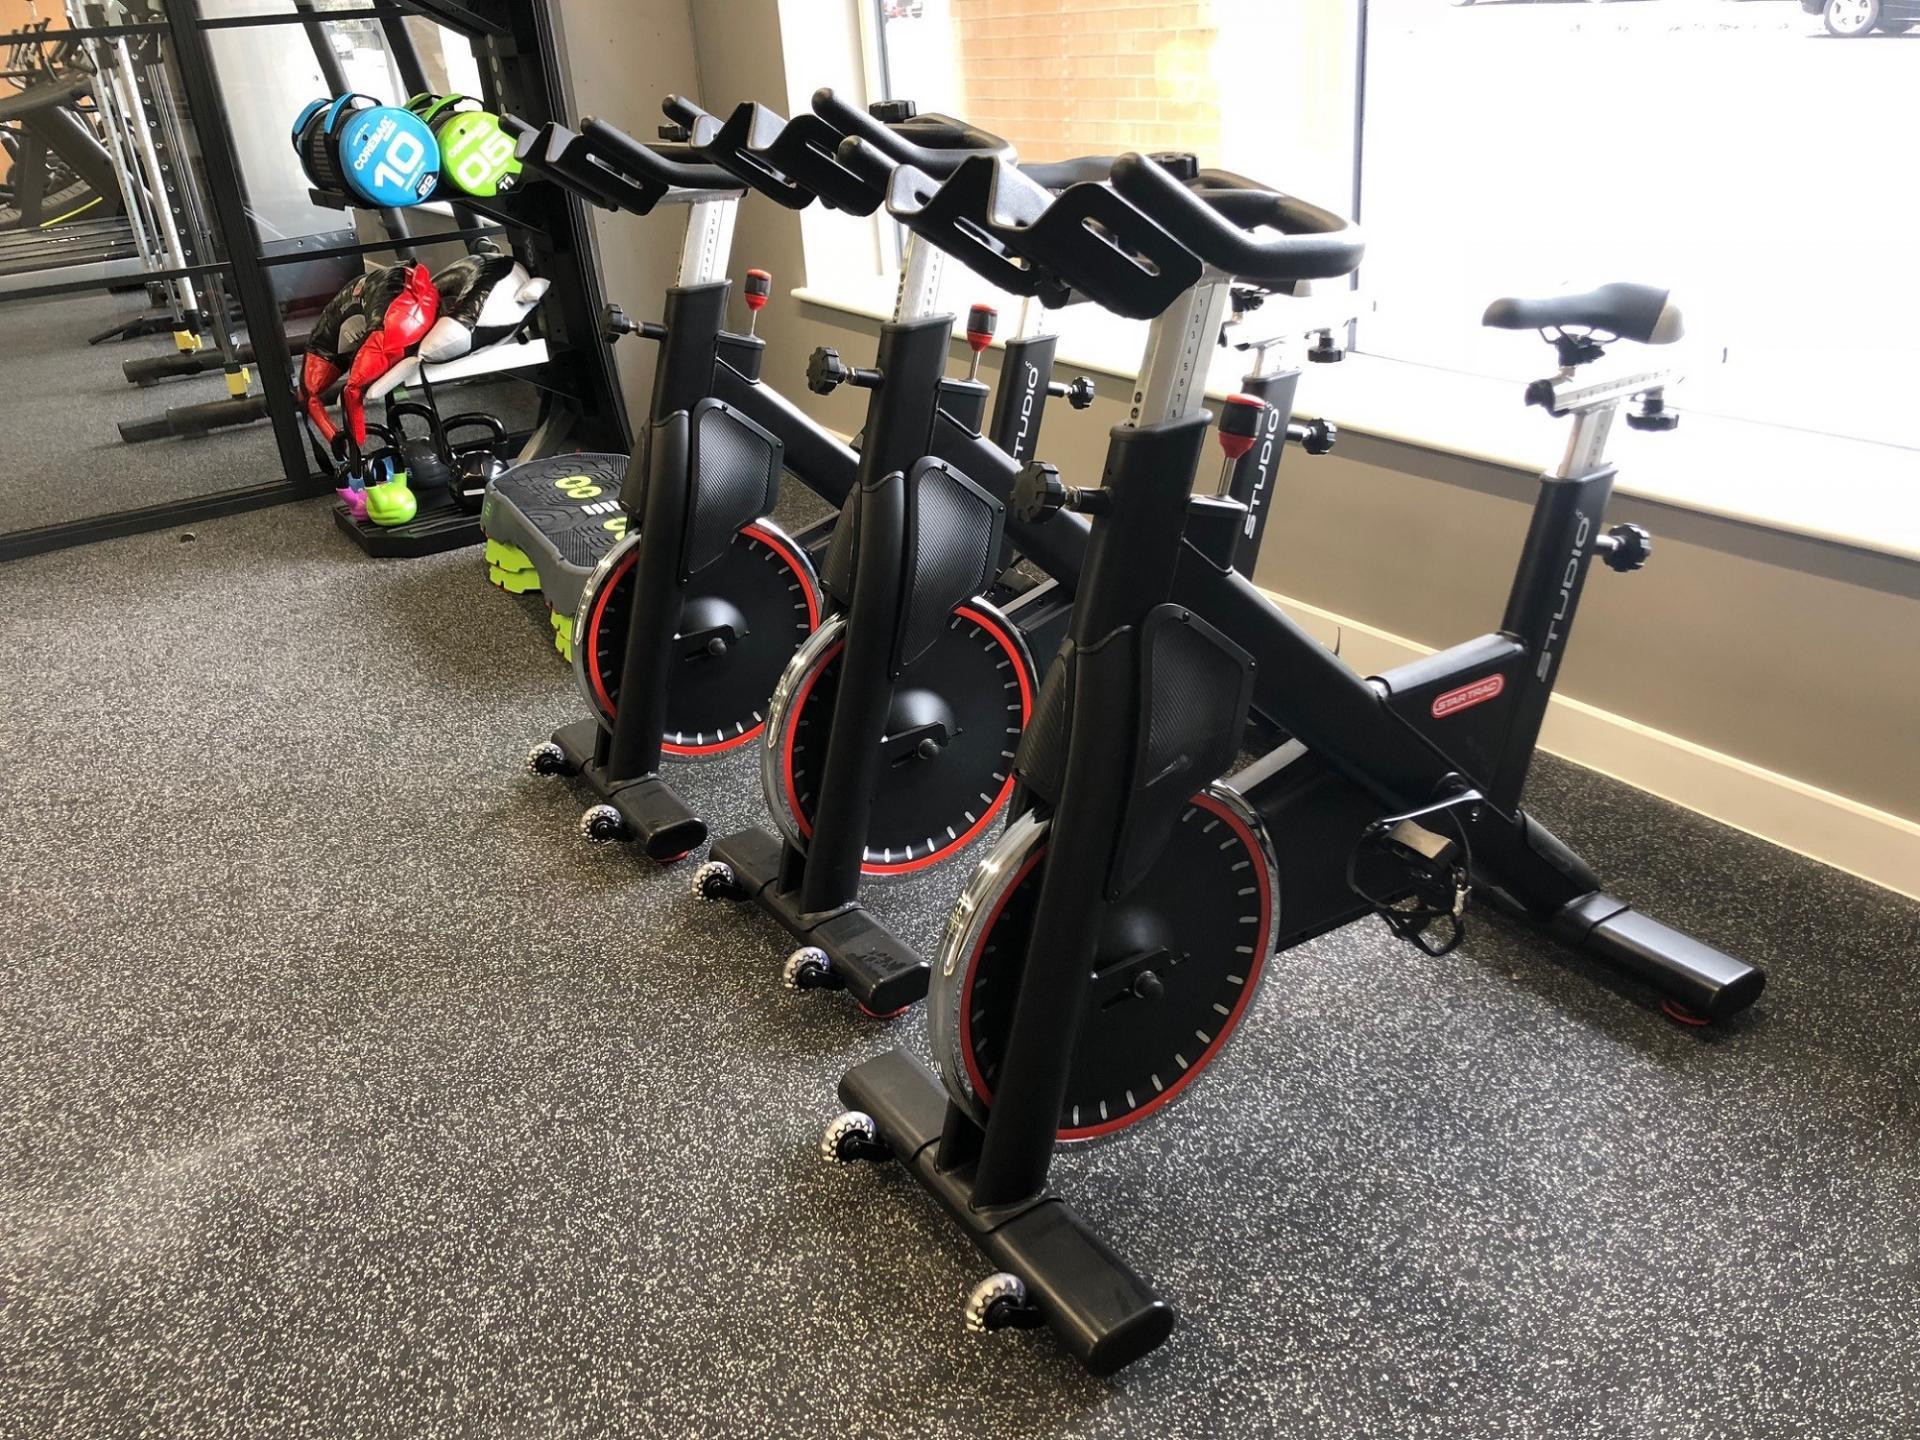 Exercise bikes at Charles Hope Southampton City Apartments - Citybase Apartments